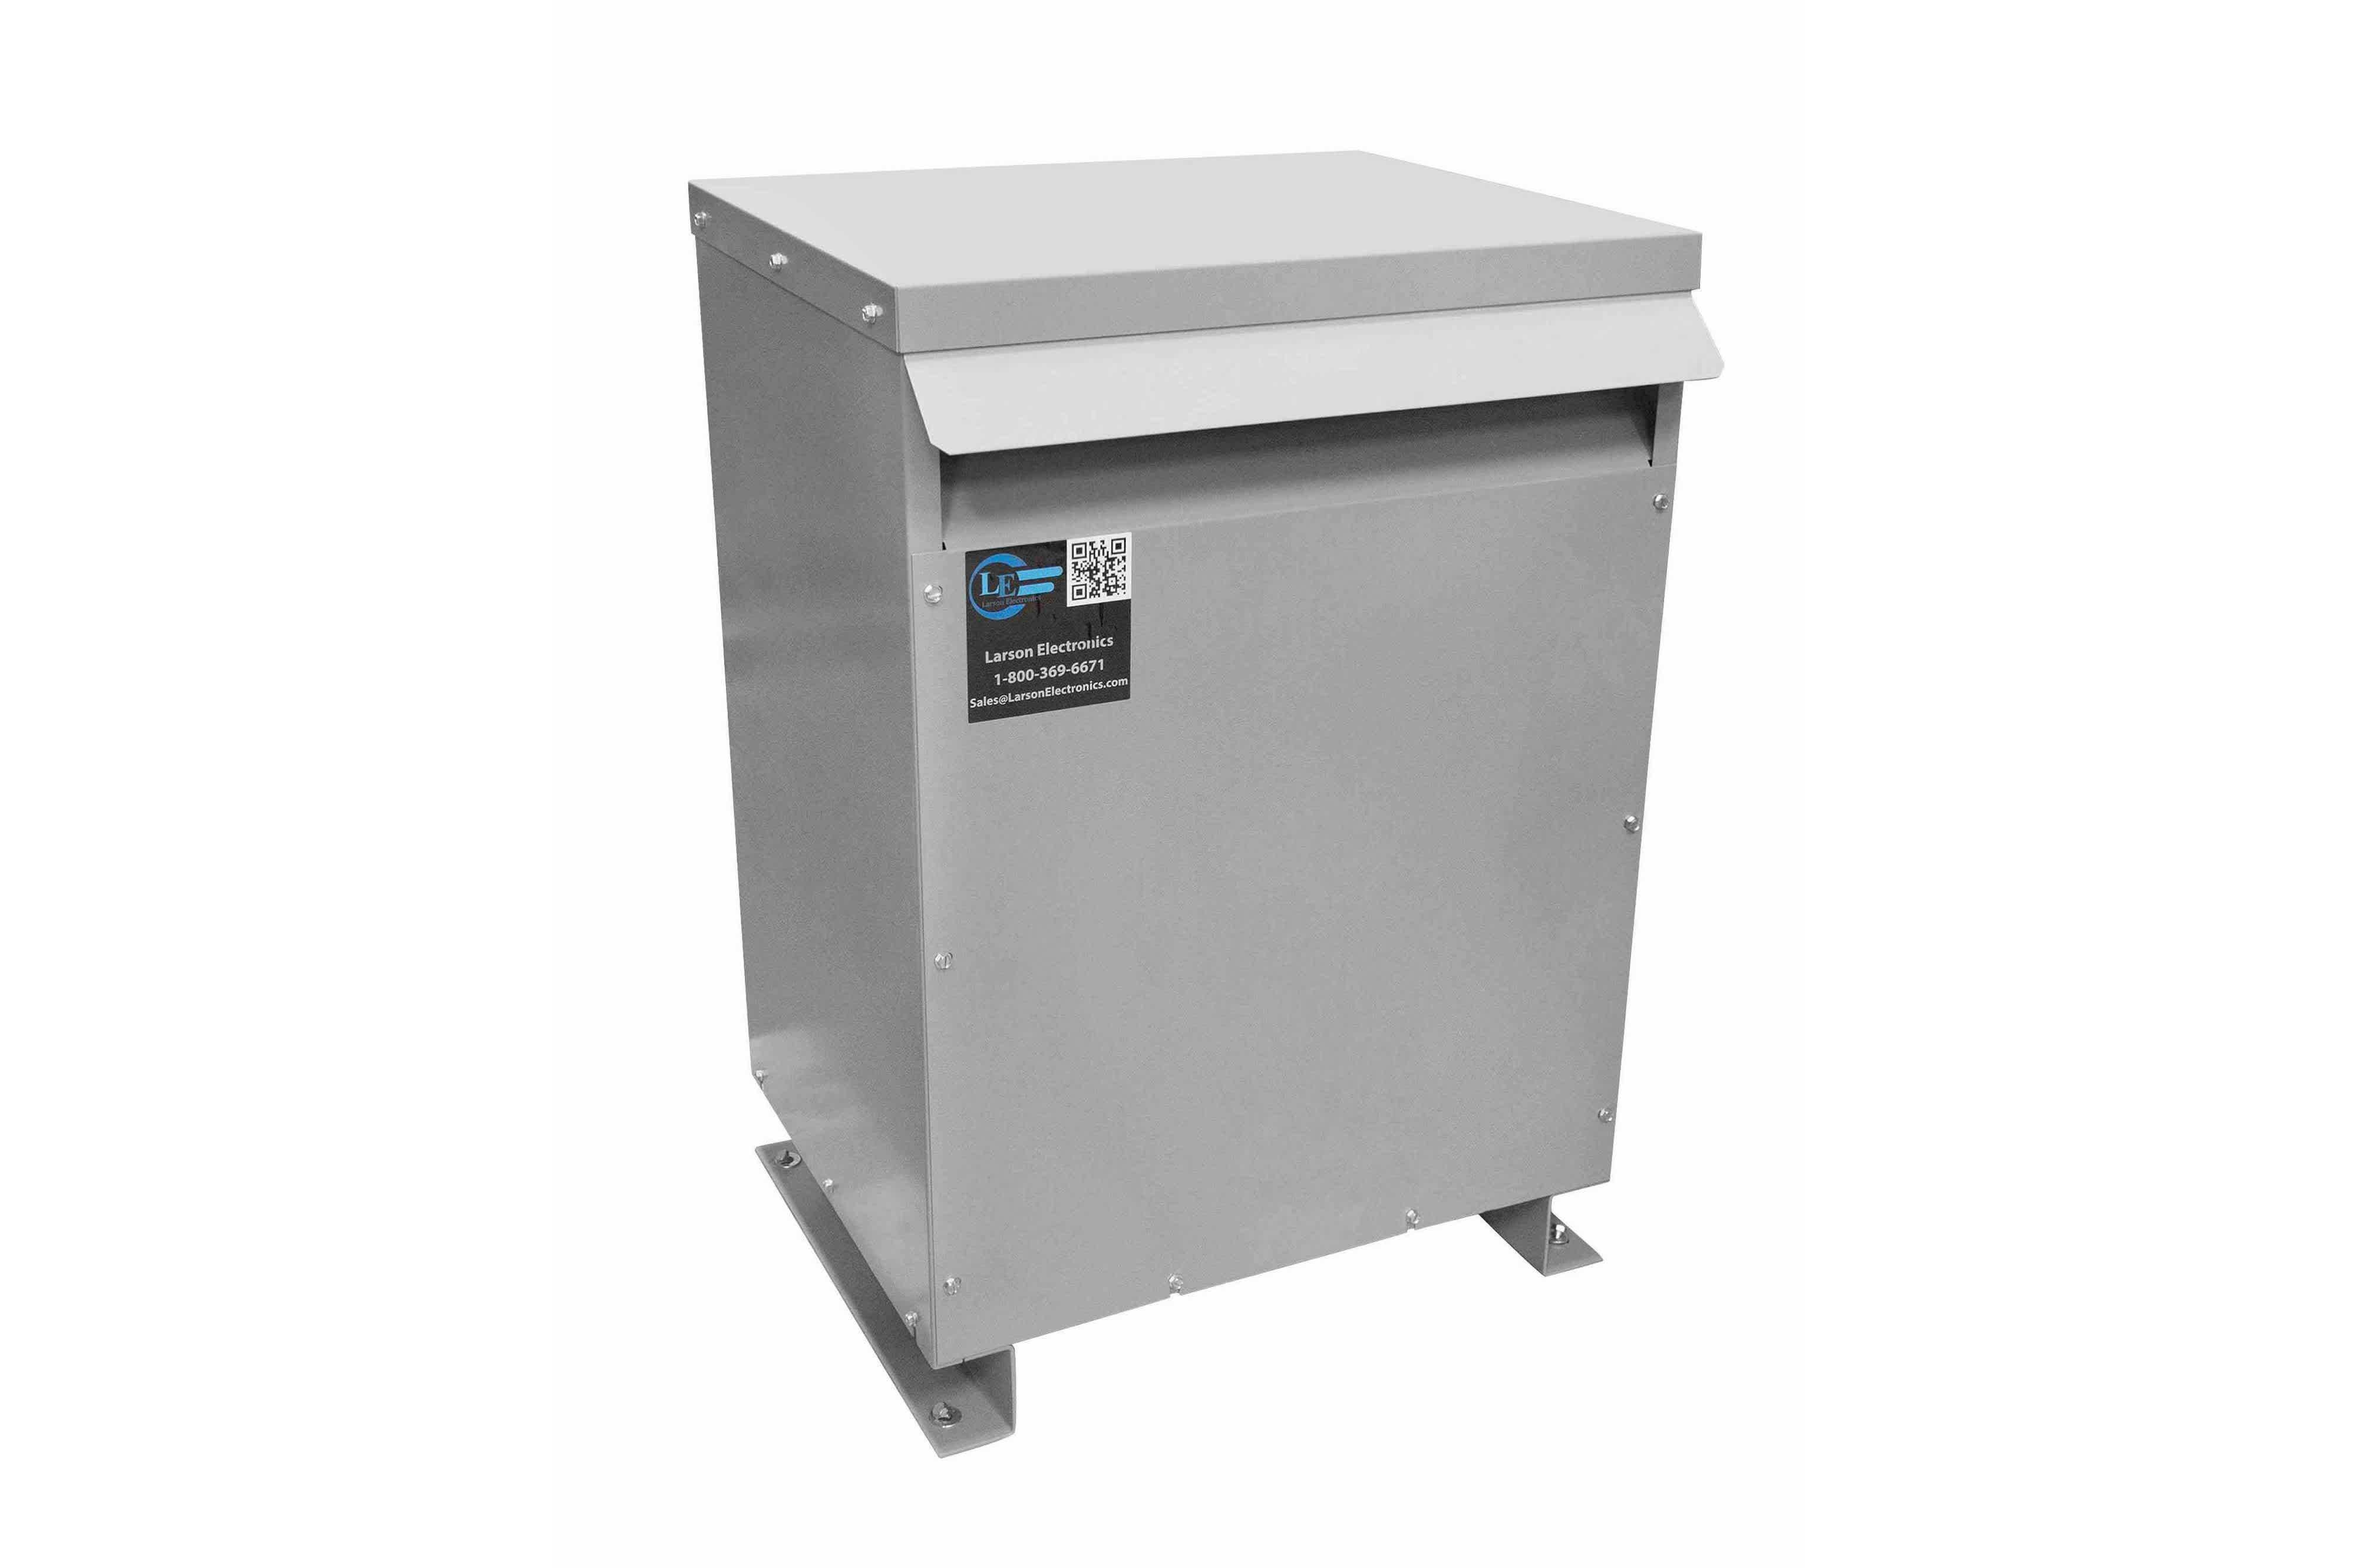 100 kVA 3PH DOE Transformer, 240V Delta Primary, 480Y/277 Wye-N Secondary, N3R, Ventilated, 60 Hz